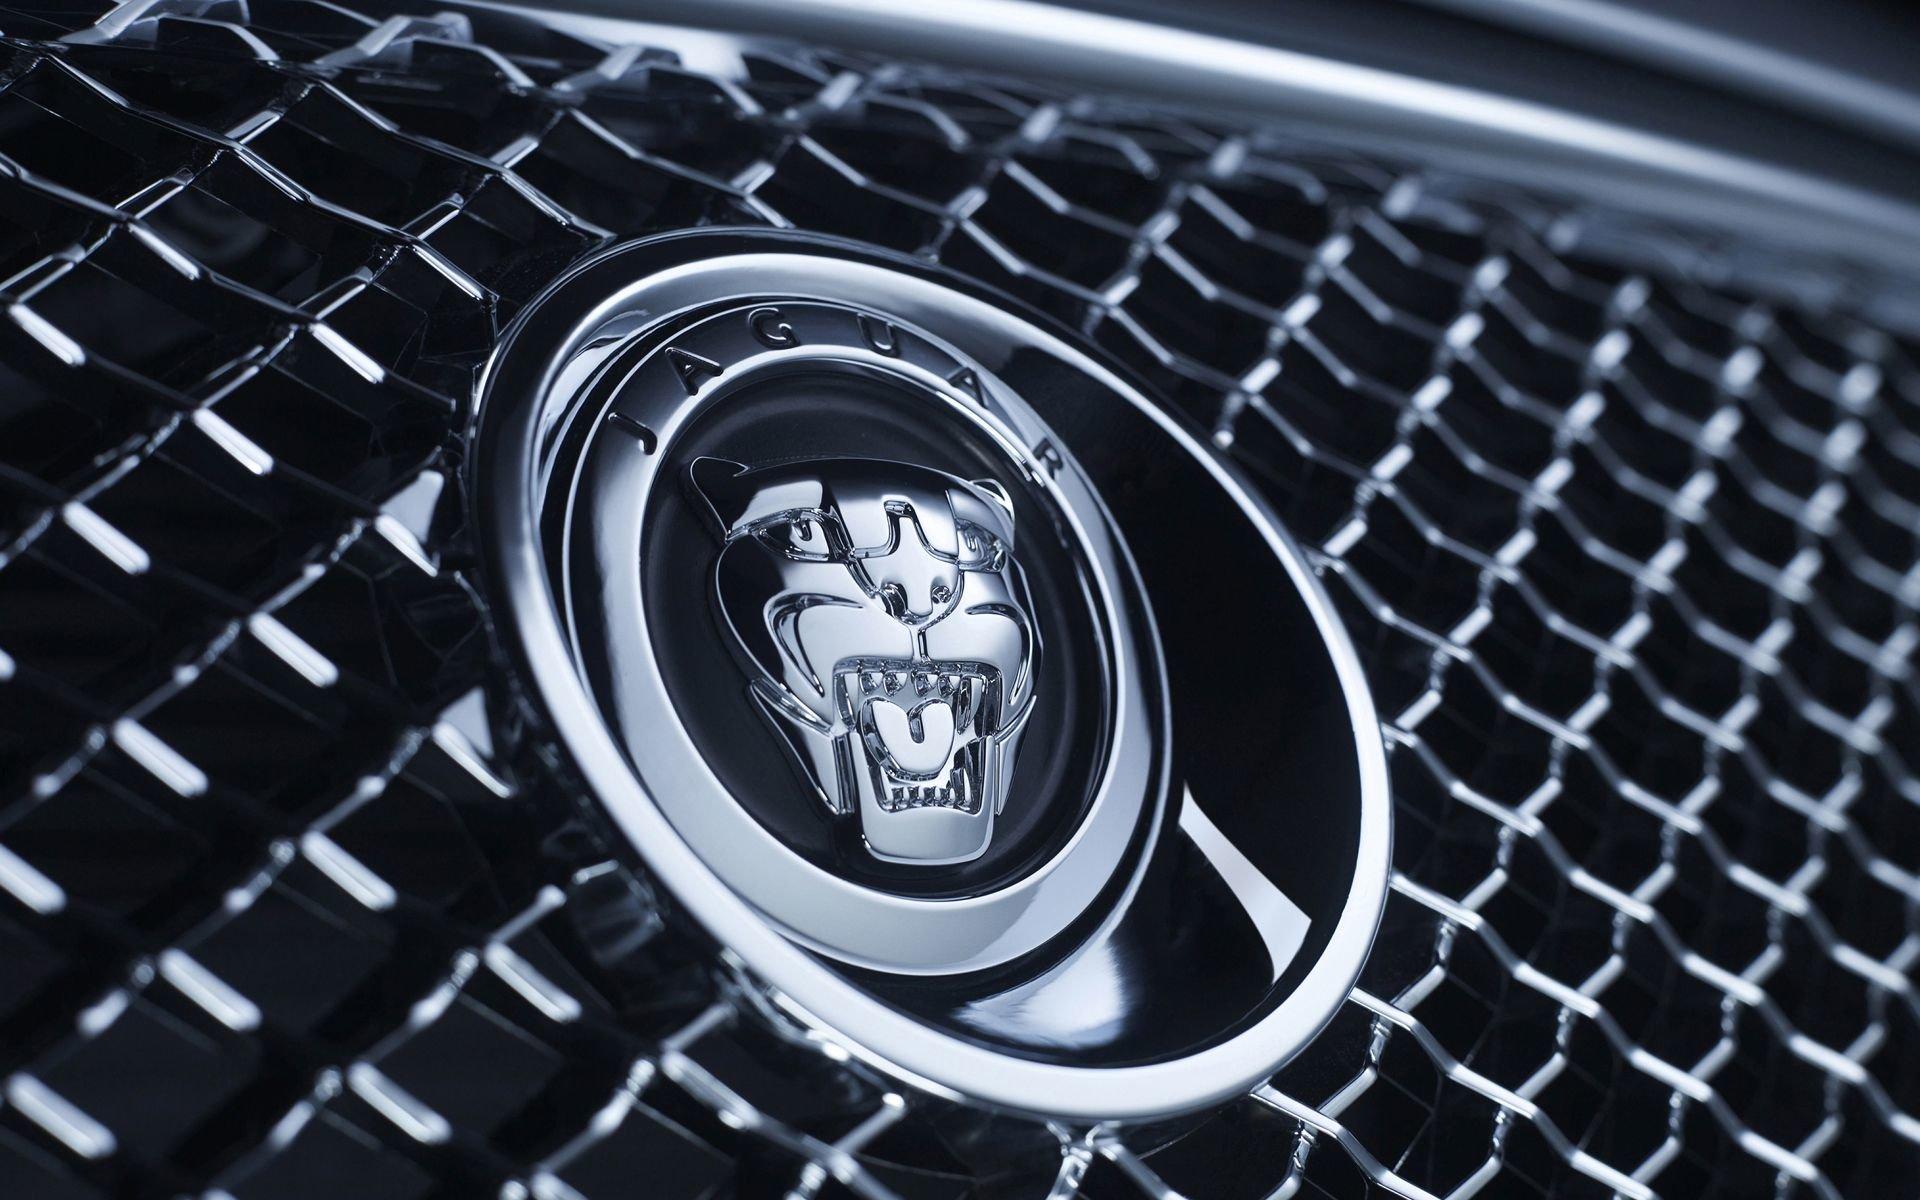 Jaguar Car Wallpapers Hd For Desktop Backgrounds